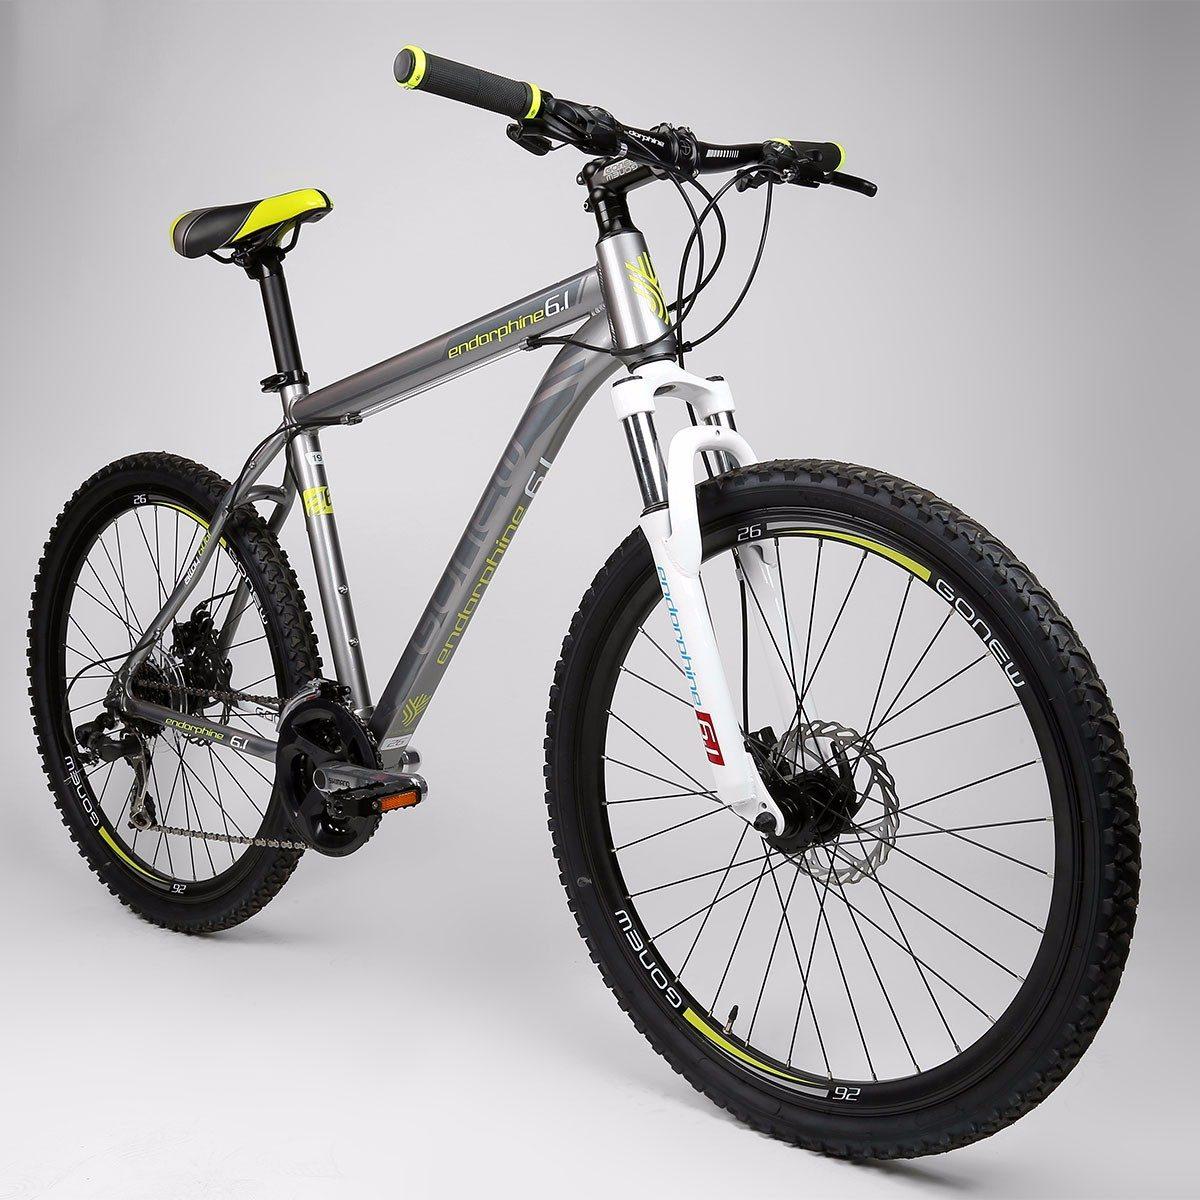 9a9ee561a bicicleta gonew endorphine shimano alumínio aro 26 19 bike. Carregando zoom.